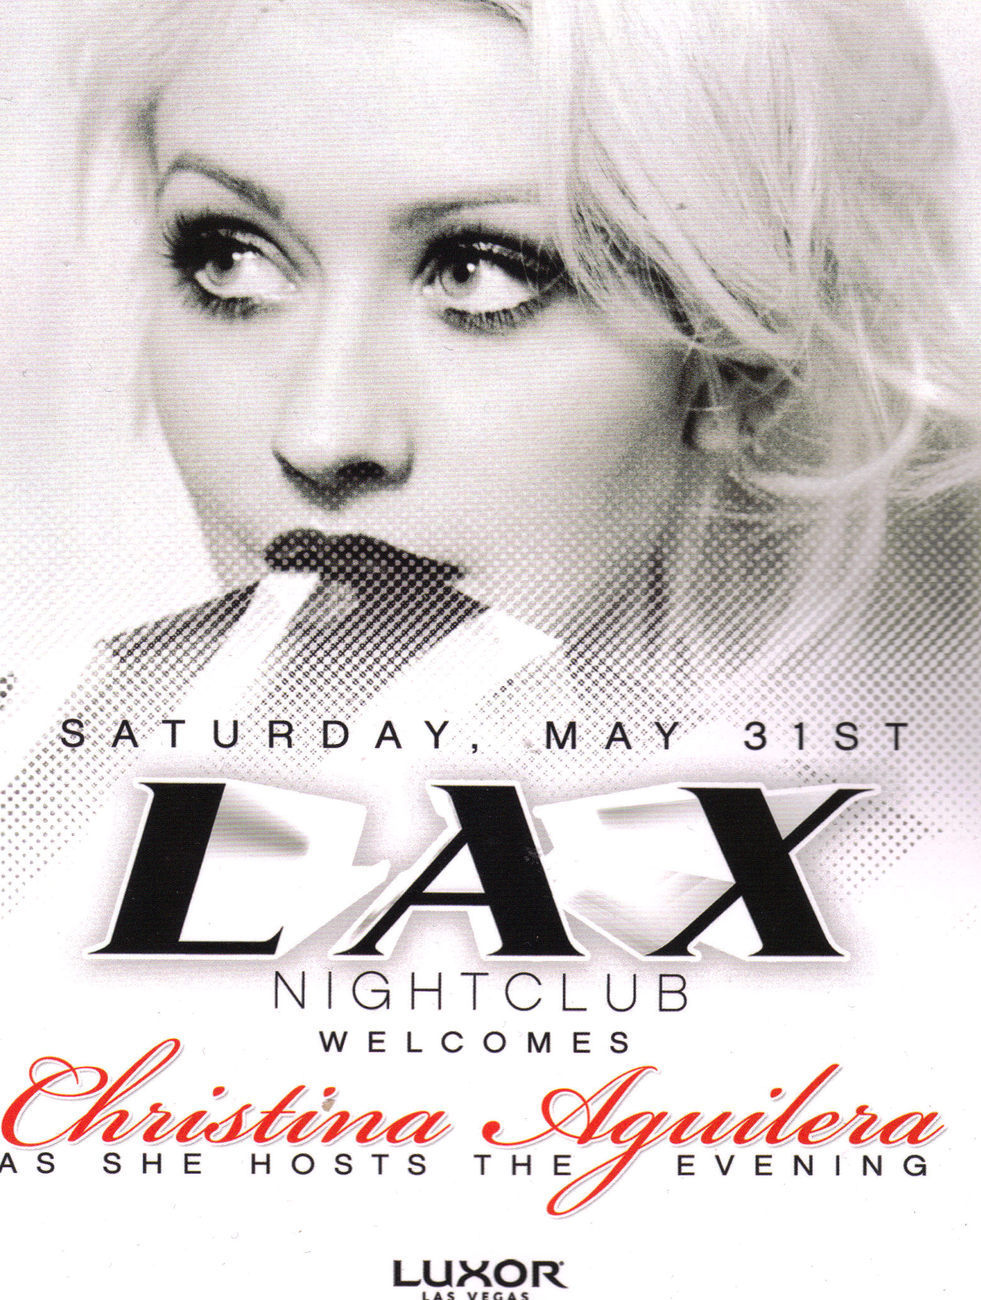 CHRISTINA AGUILERA PROMO CARD, LAX Las Vegas